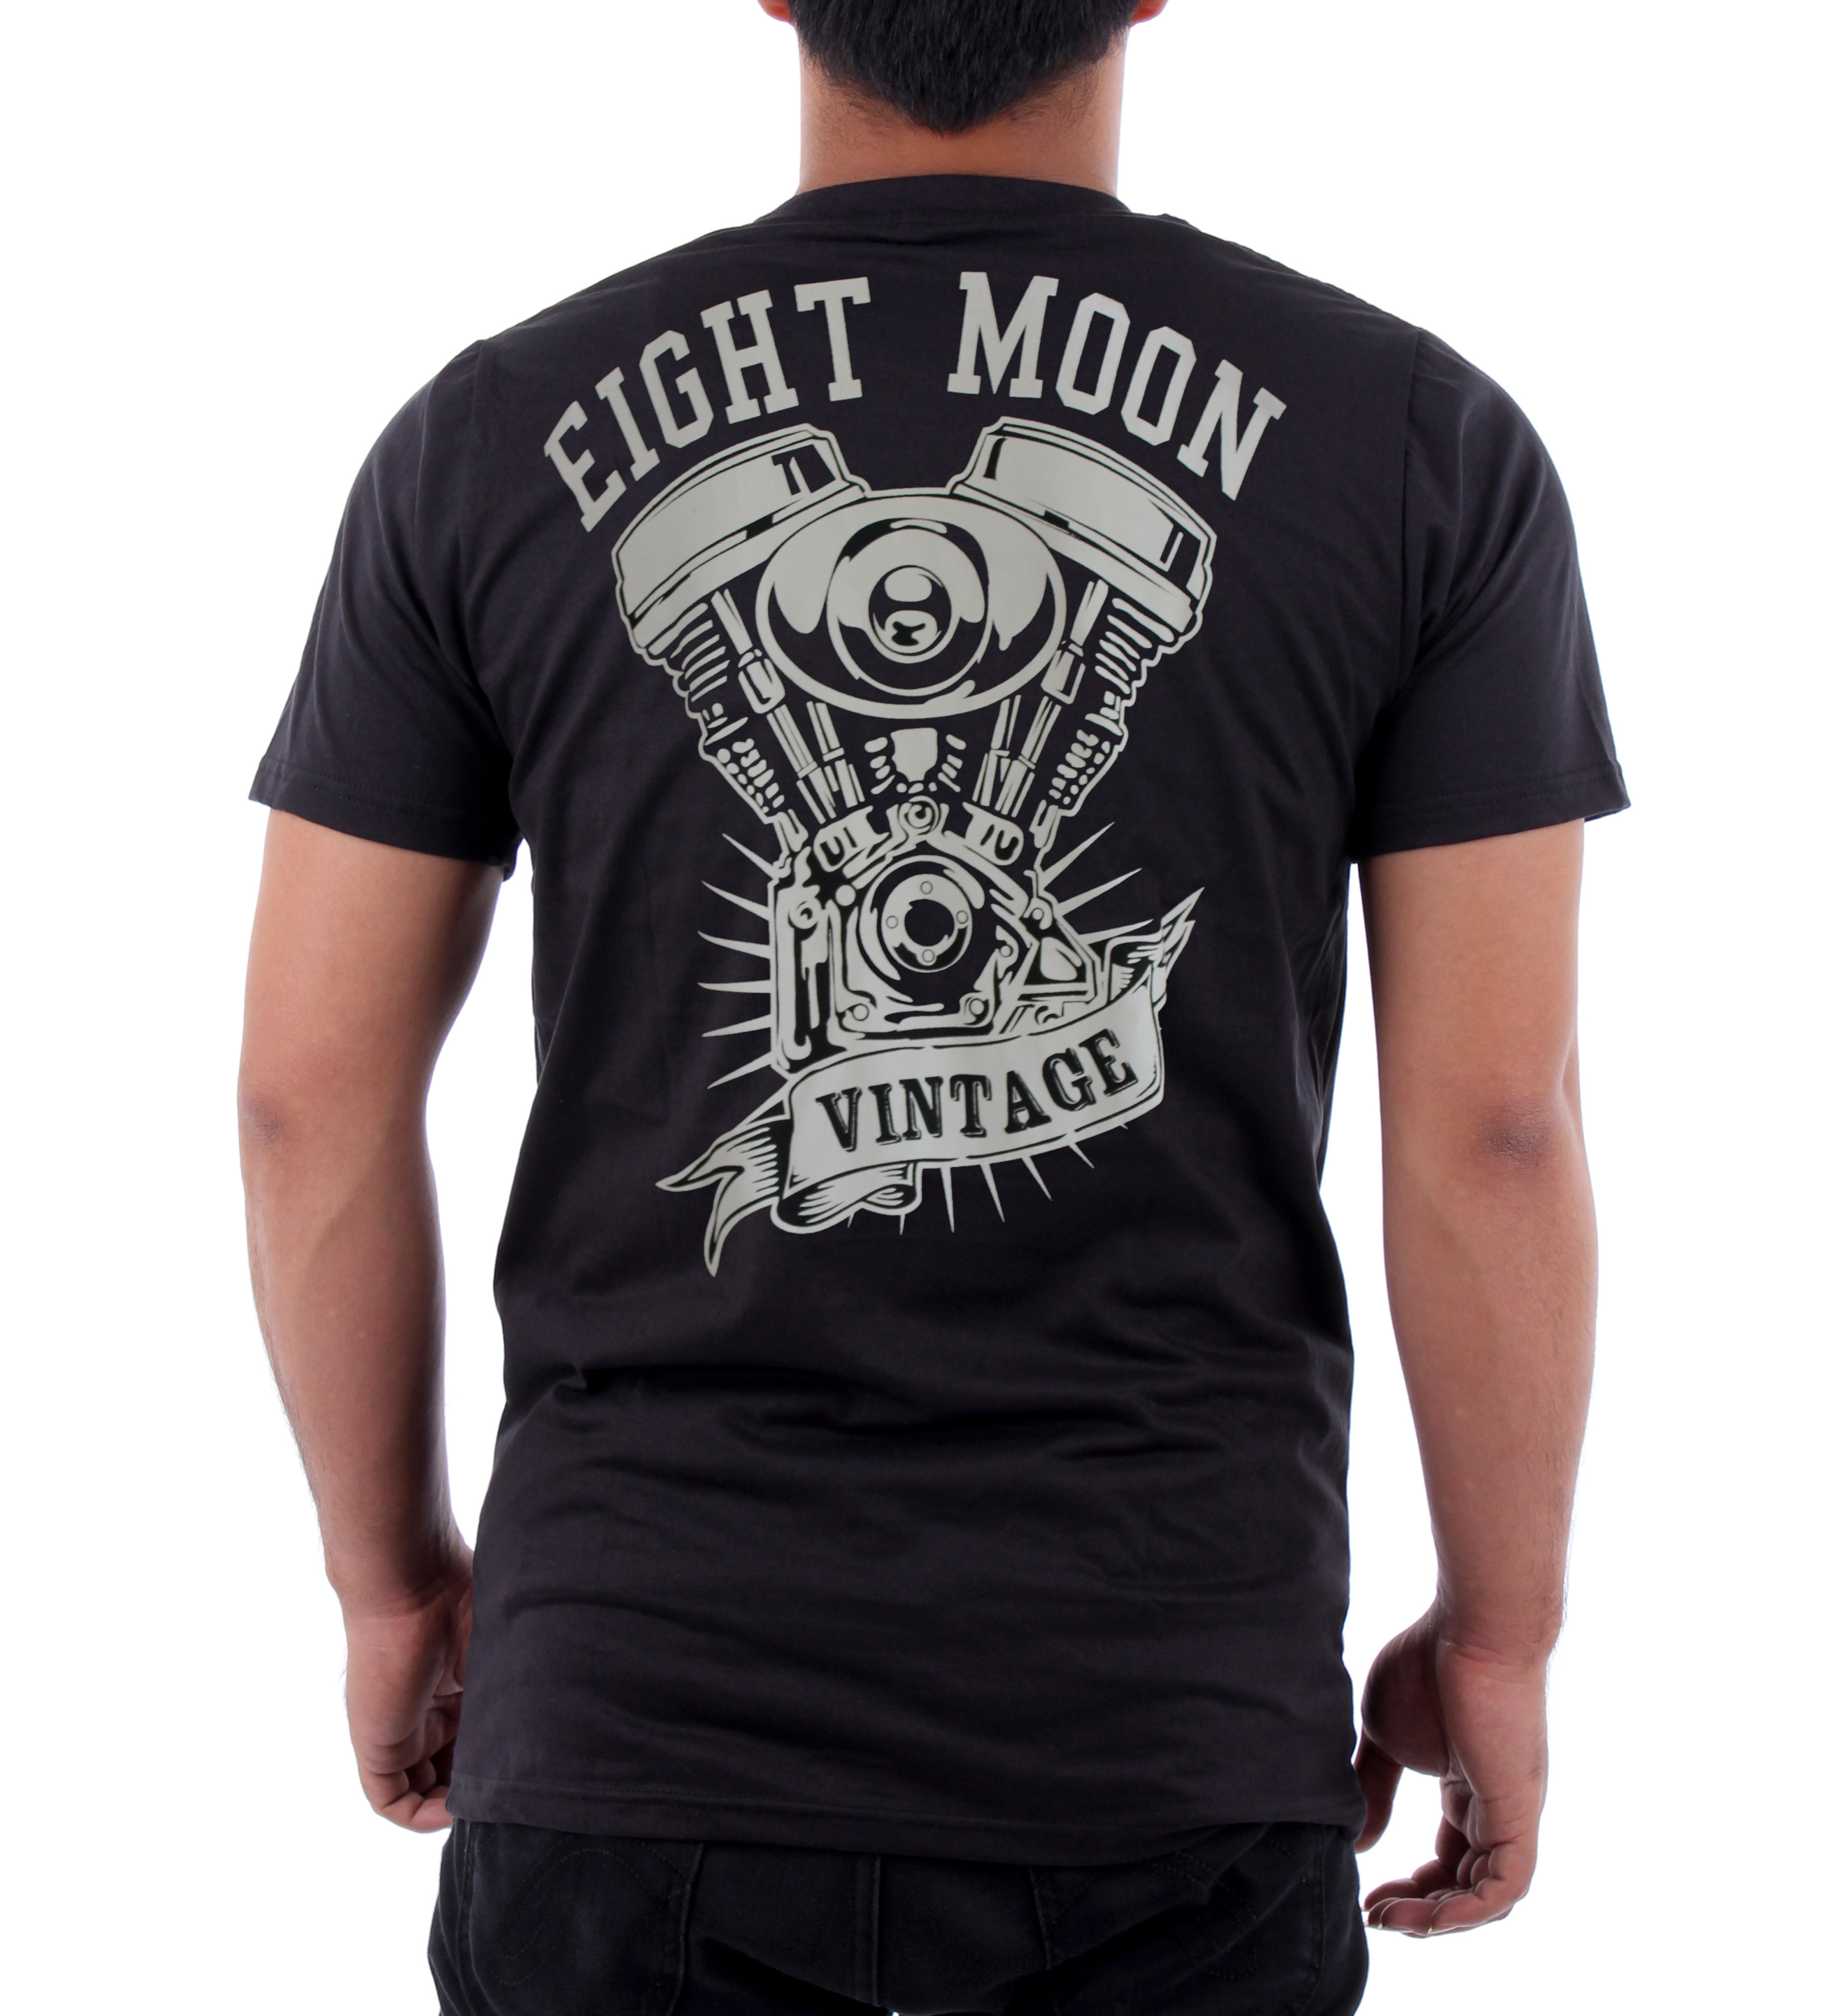 eight_moon_rockabilly_mens_shirt_engine_vintage_motorcycle_rock_en7_t_shirts_4.jpg